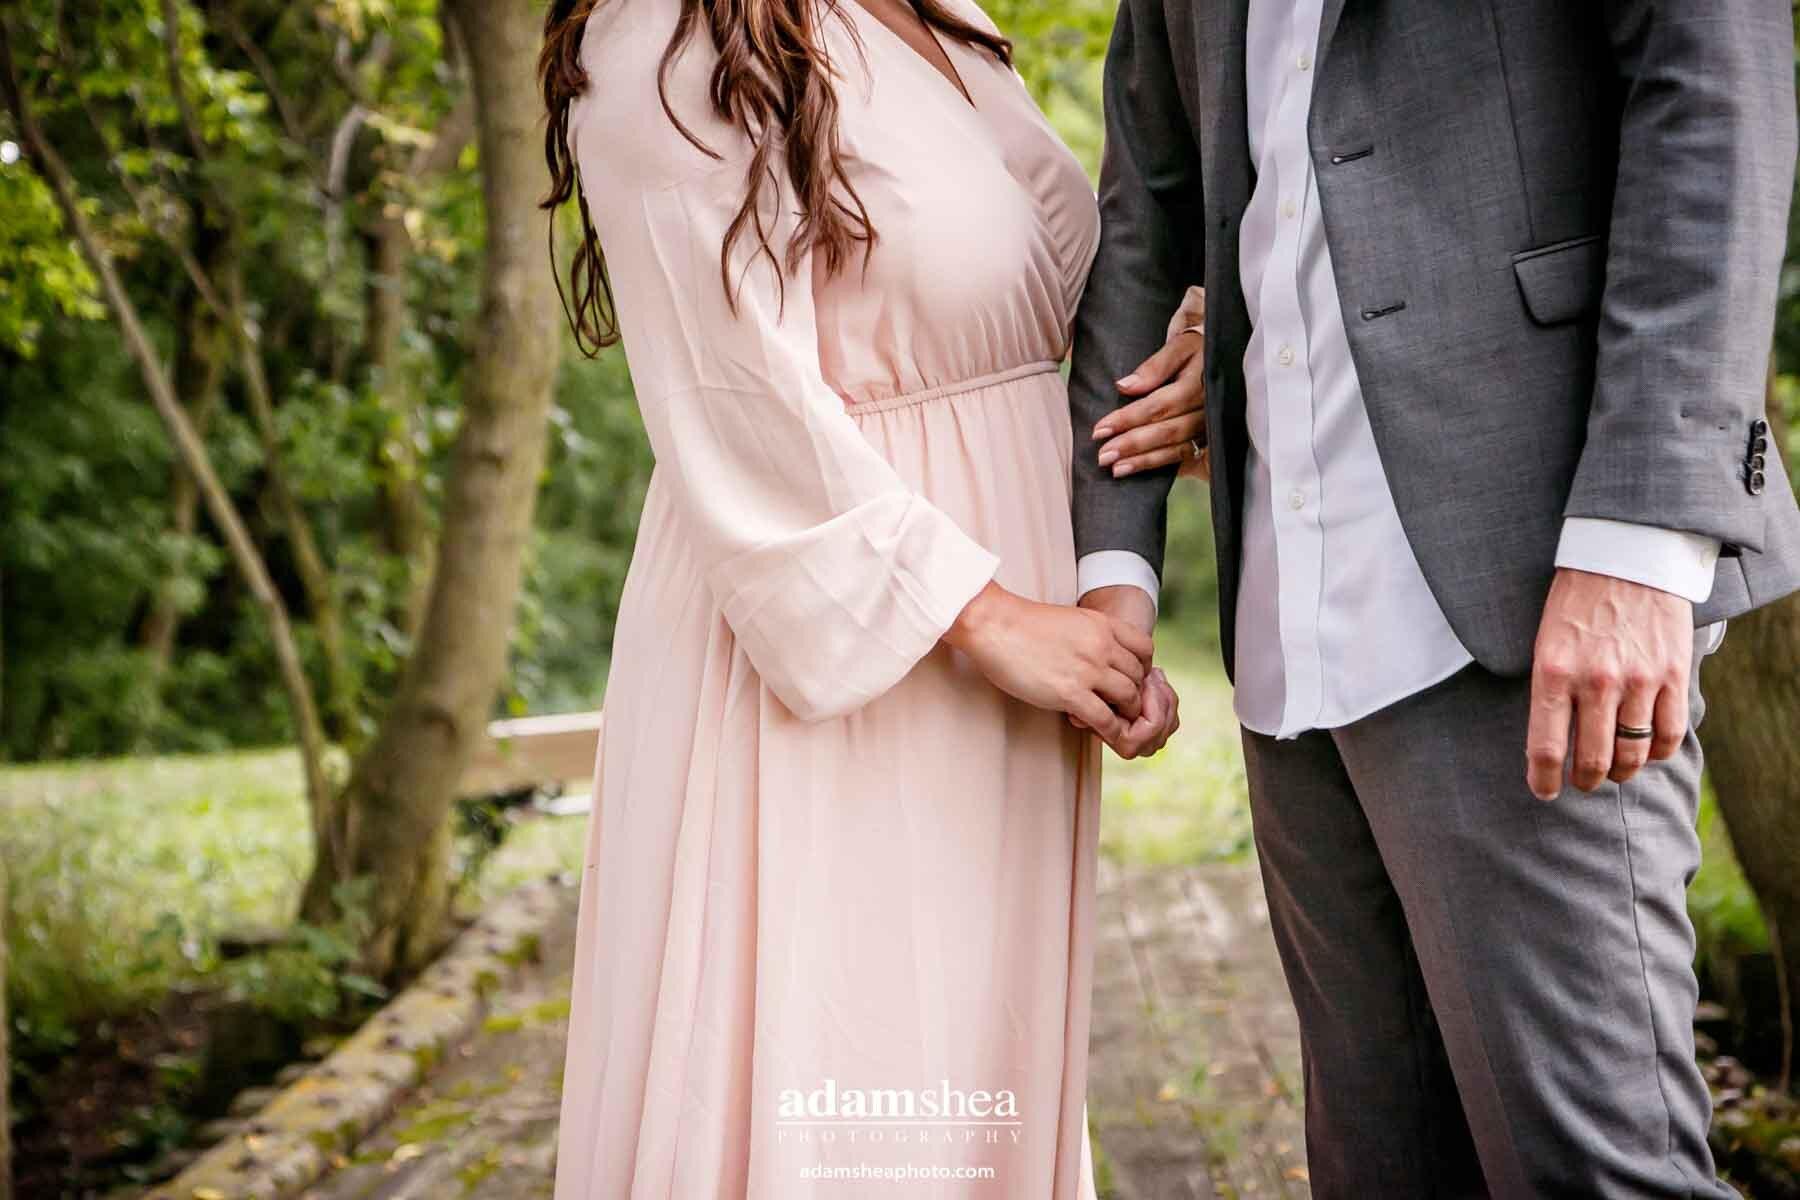 amy-adam-engagement-photos-larsen-wi-neenah-winding-trail-flowy-dress-grey-suit-adam-shea-photography-green-bay-appleton-neenah-photographer-8.jpg